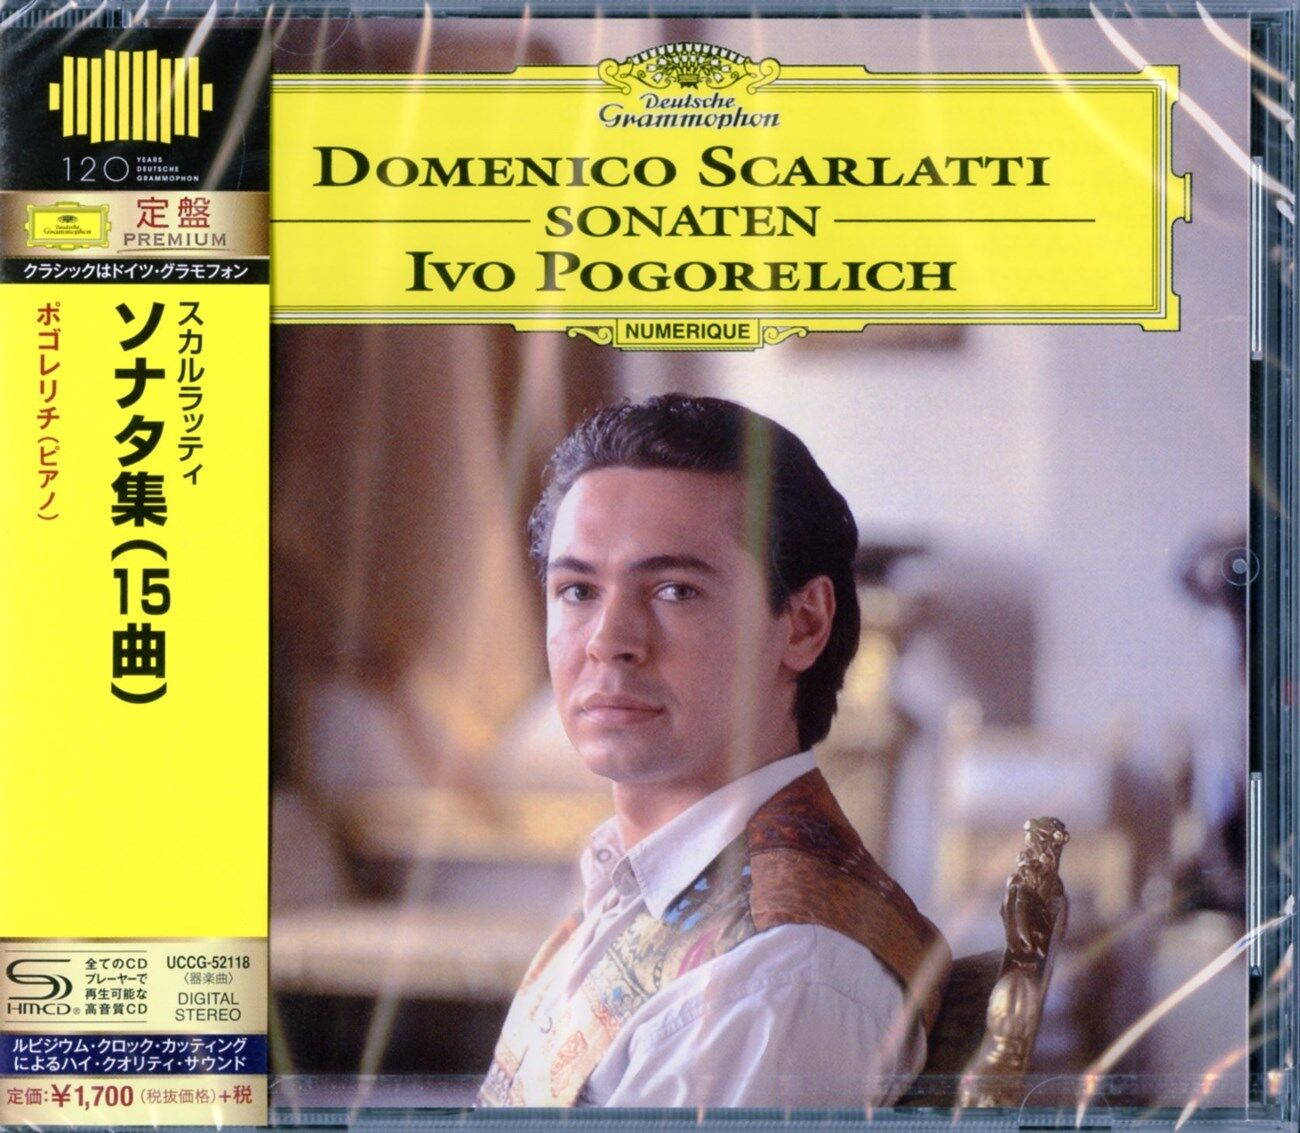 Ivo Pogorelich Scarlatti Sonatas Japan Shm Cd D46 For Sale Online Ebay